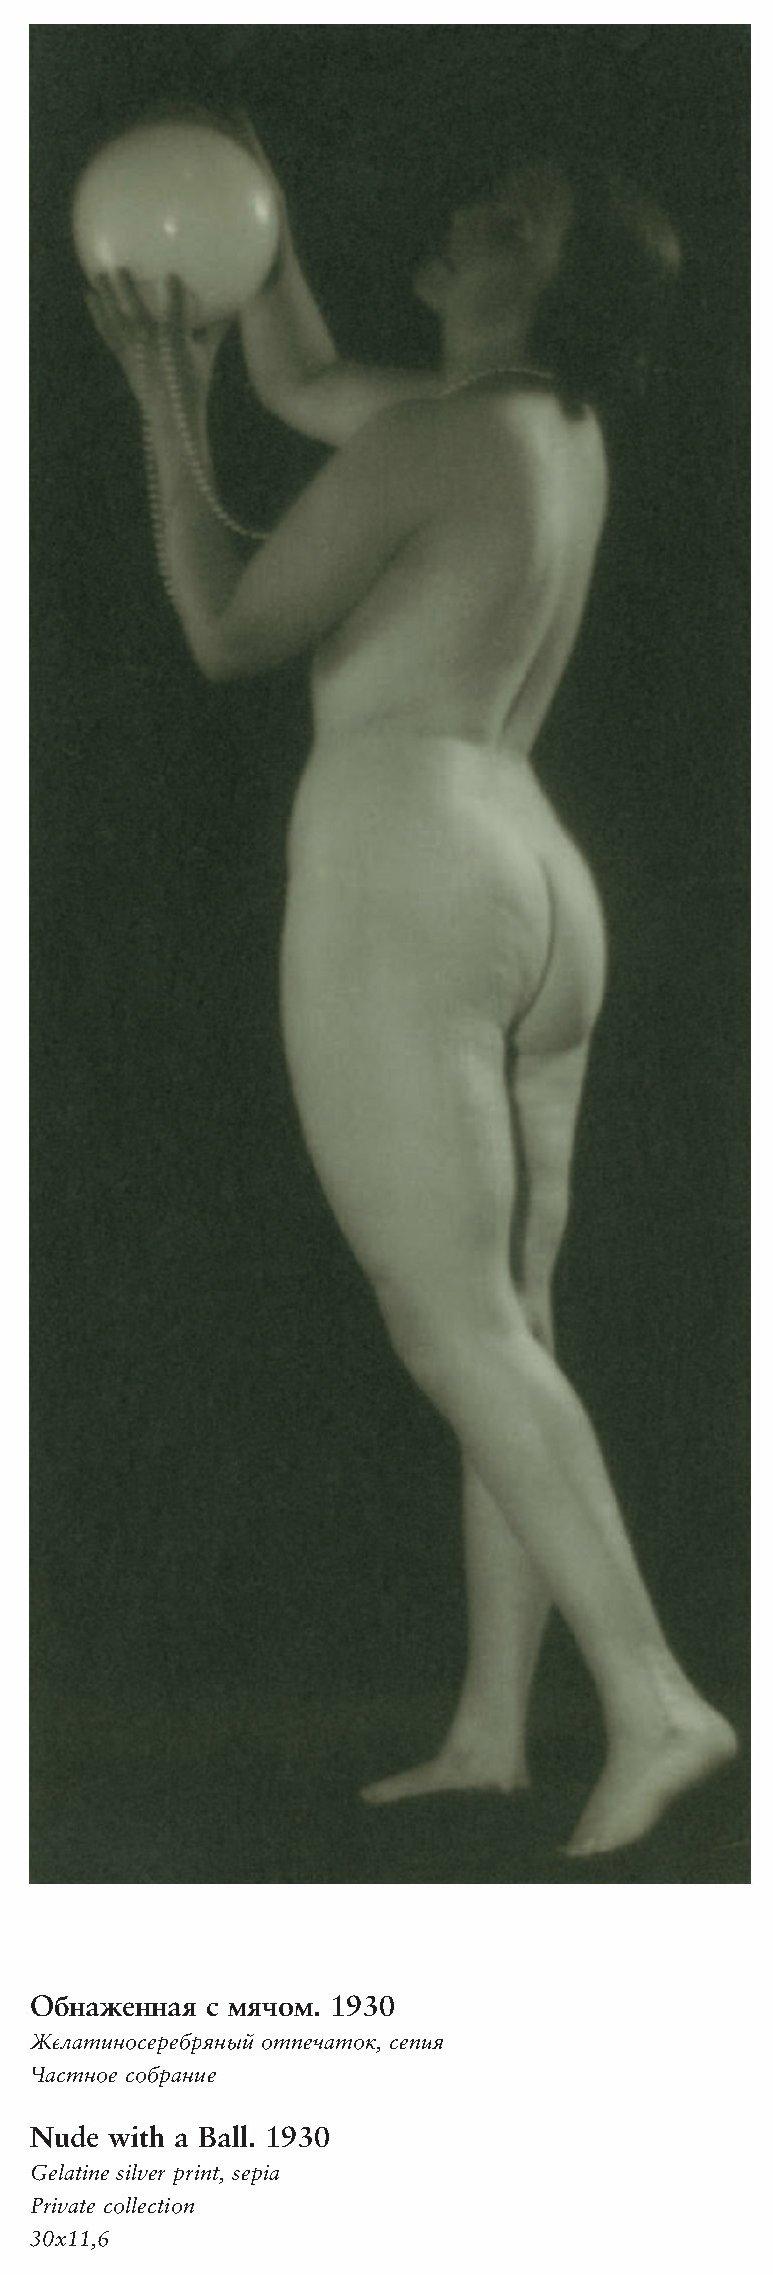 Эротика 30 годах 12 фотография